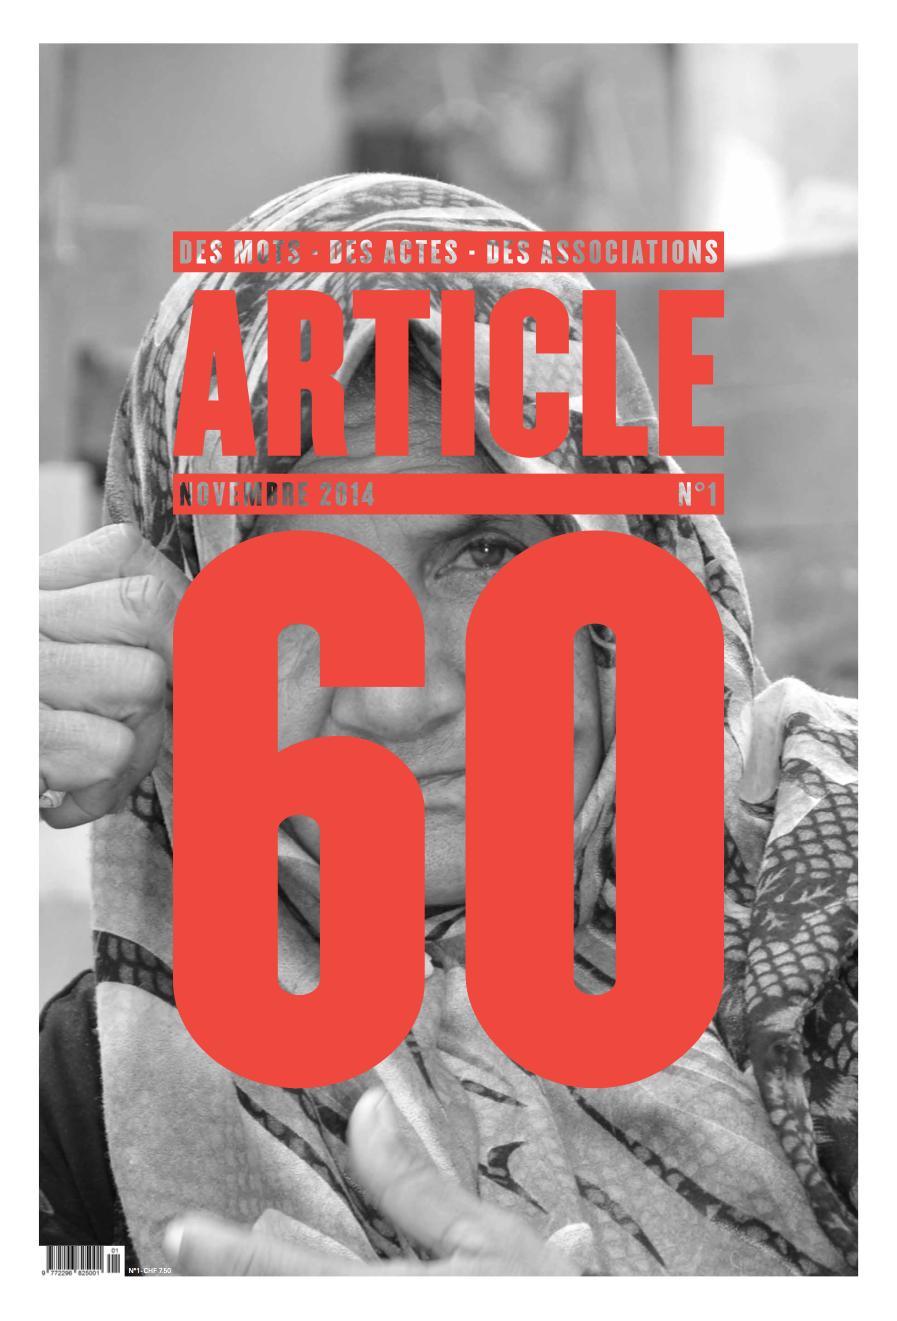 Article 60 N°1 UNE